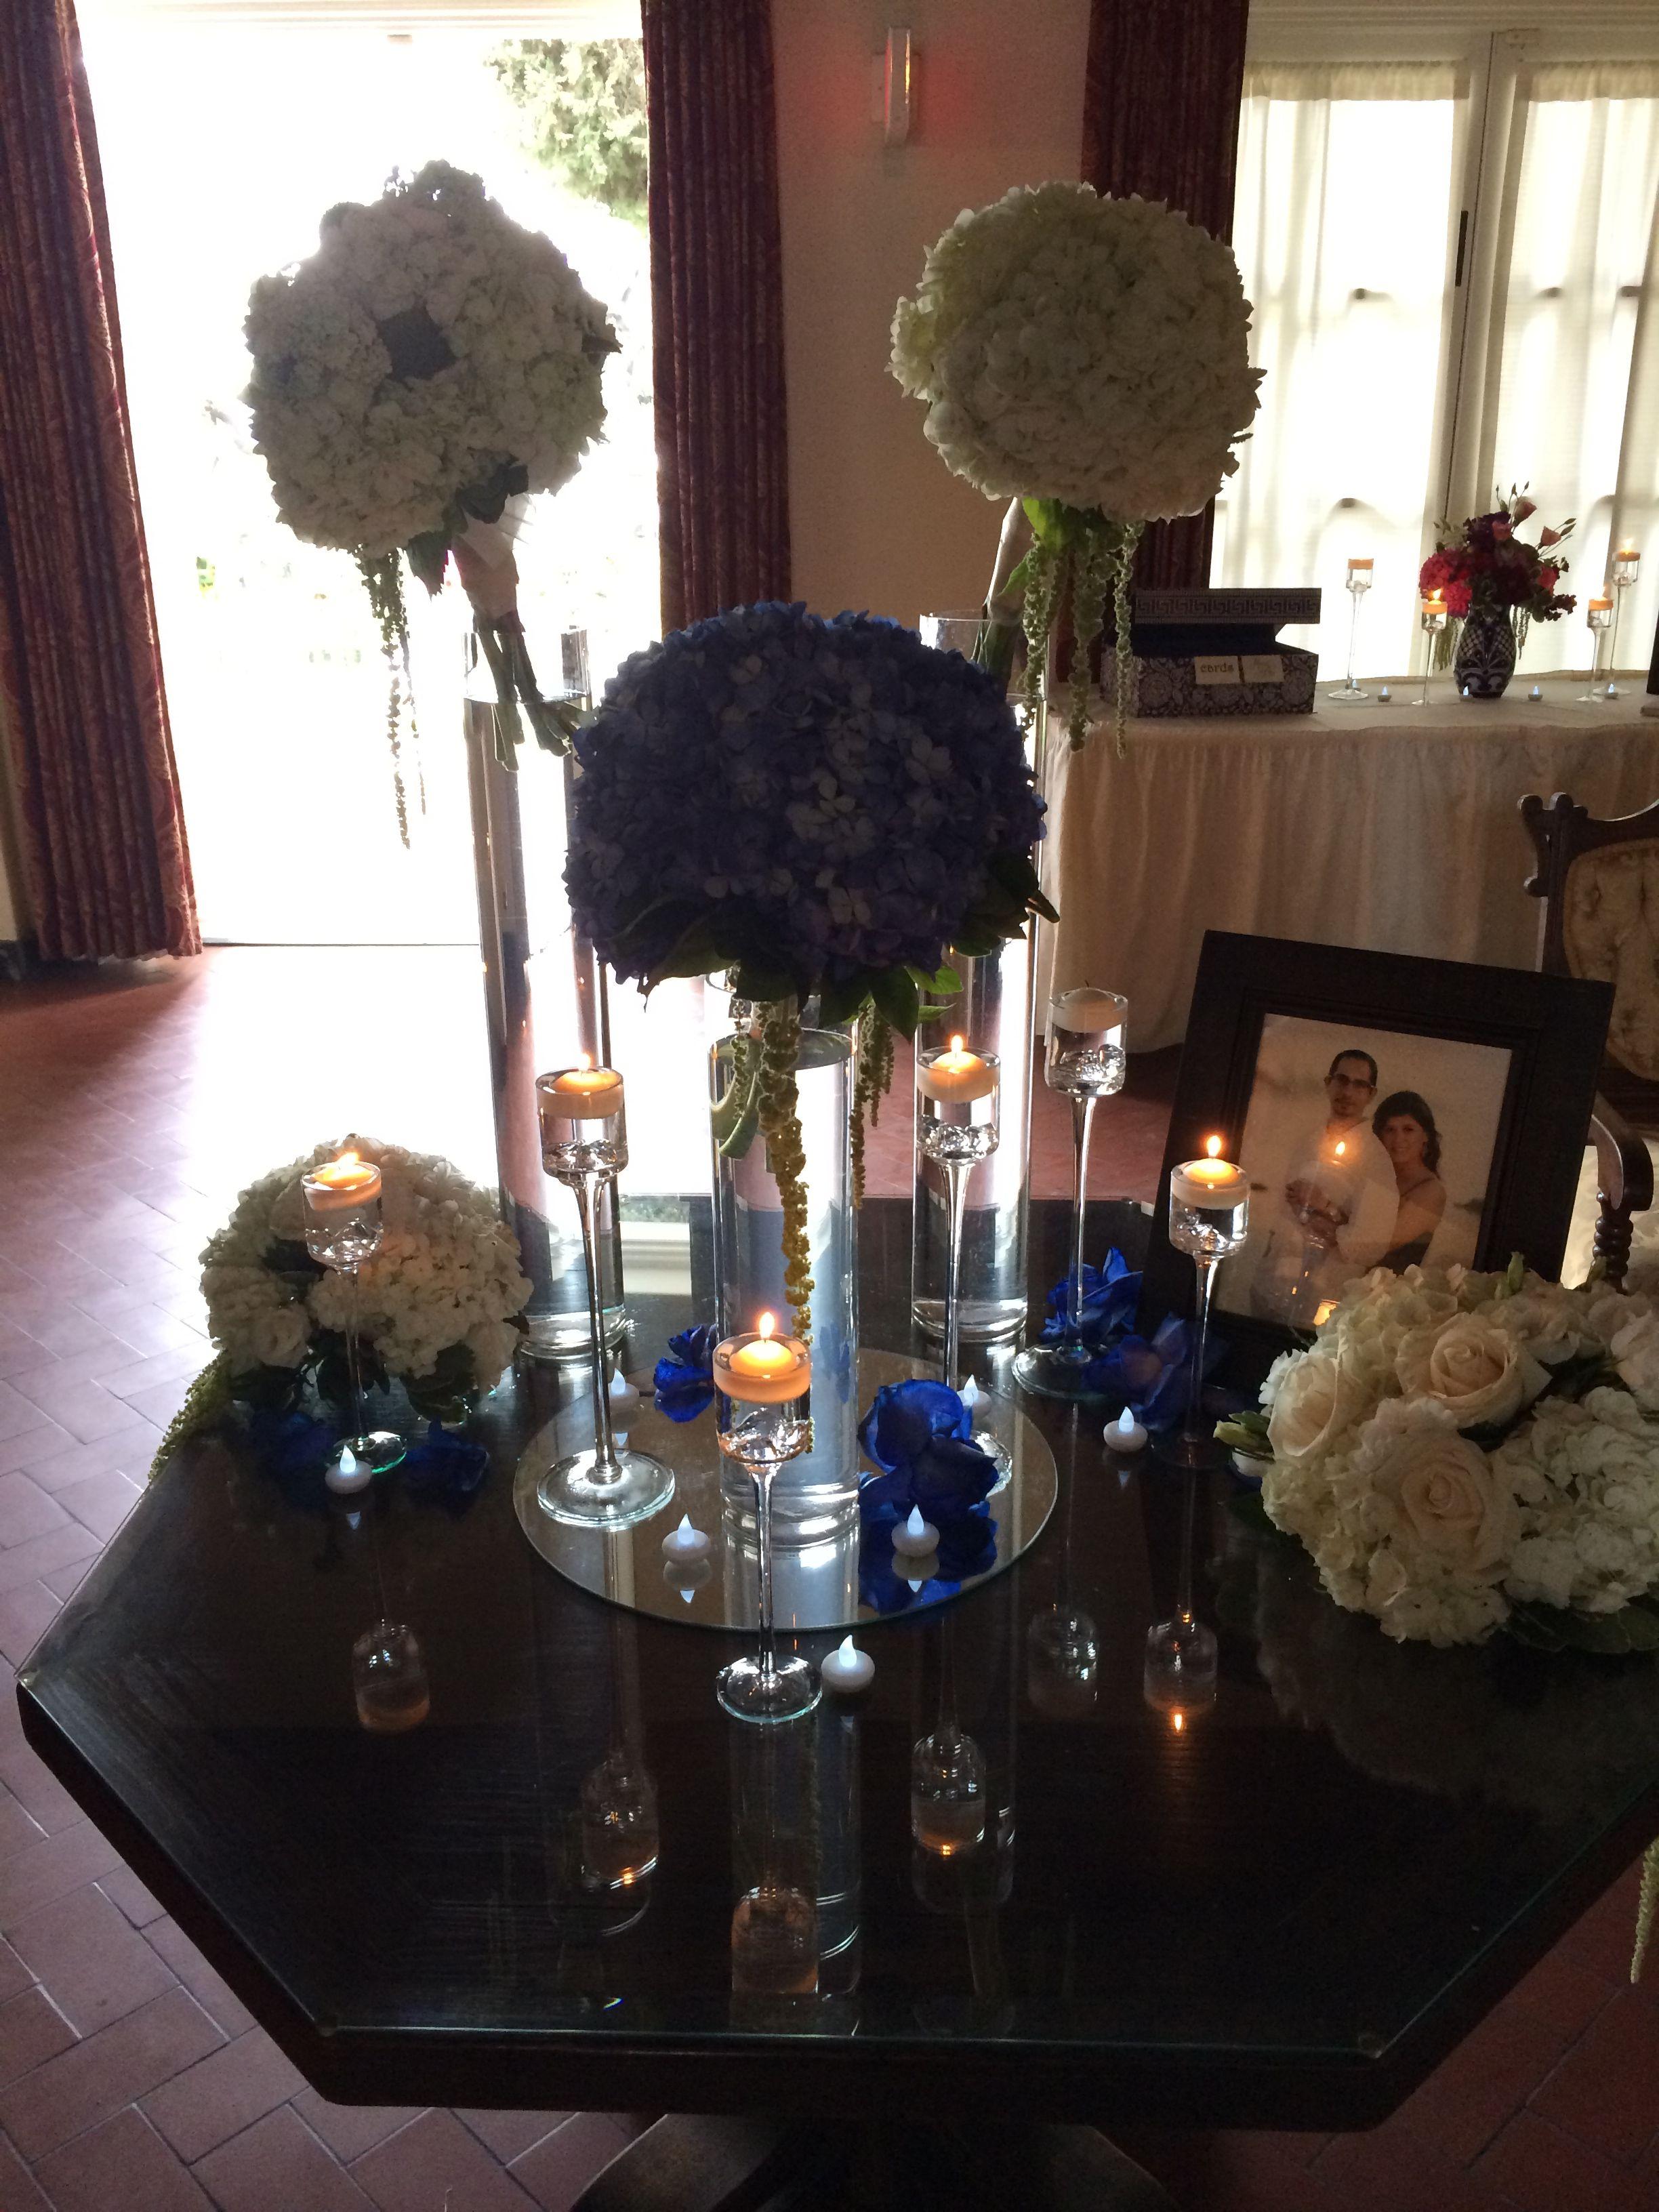 Reception table in the foyer of the #kellogghouse #wedding #weddingvenue #venue #love #marriage #reception #husbandandwife